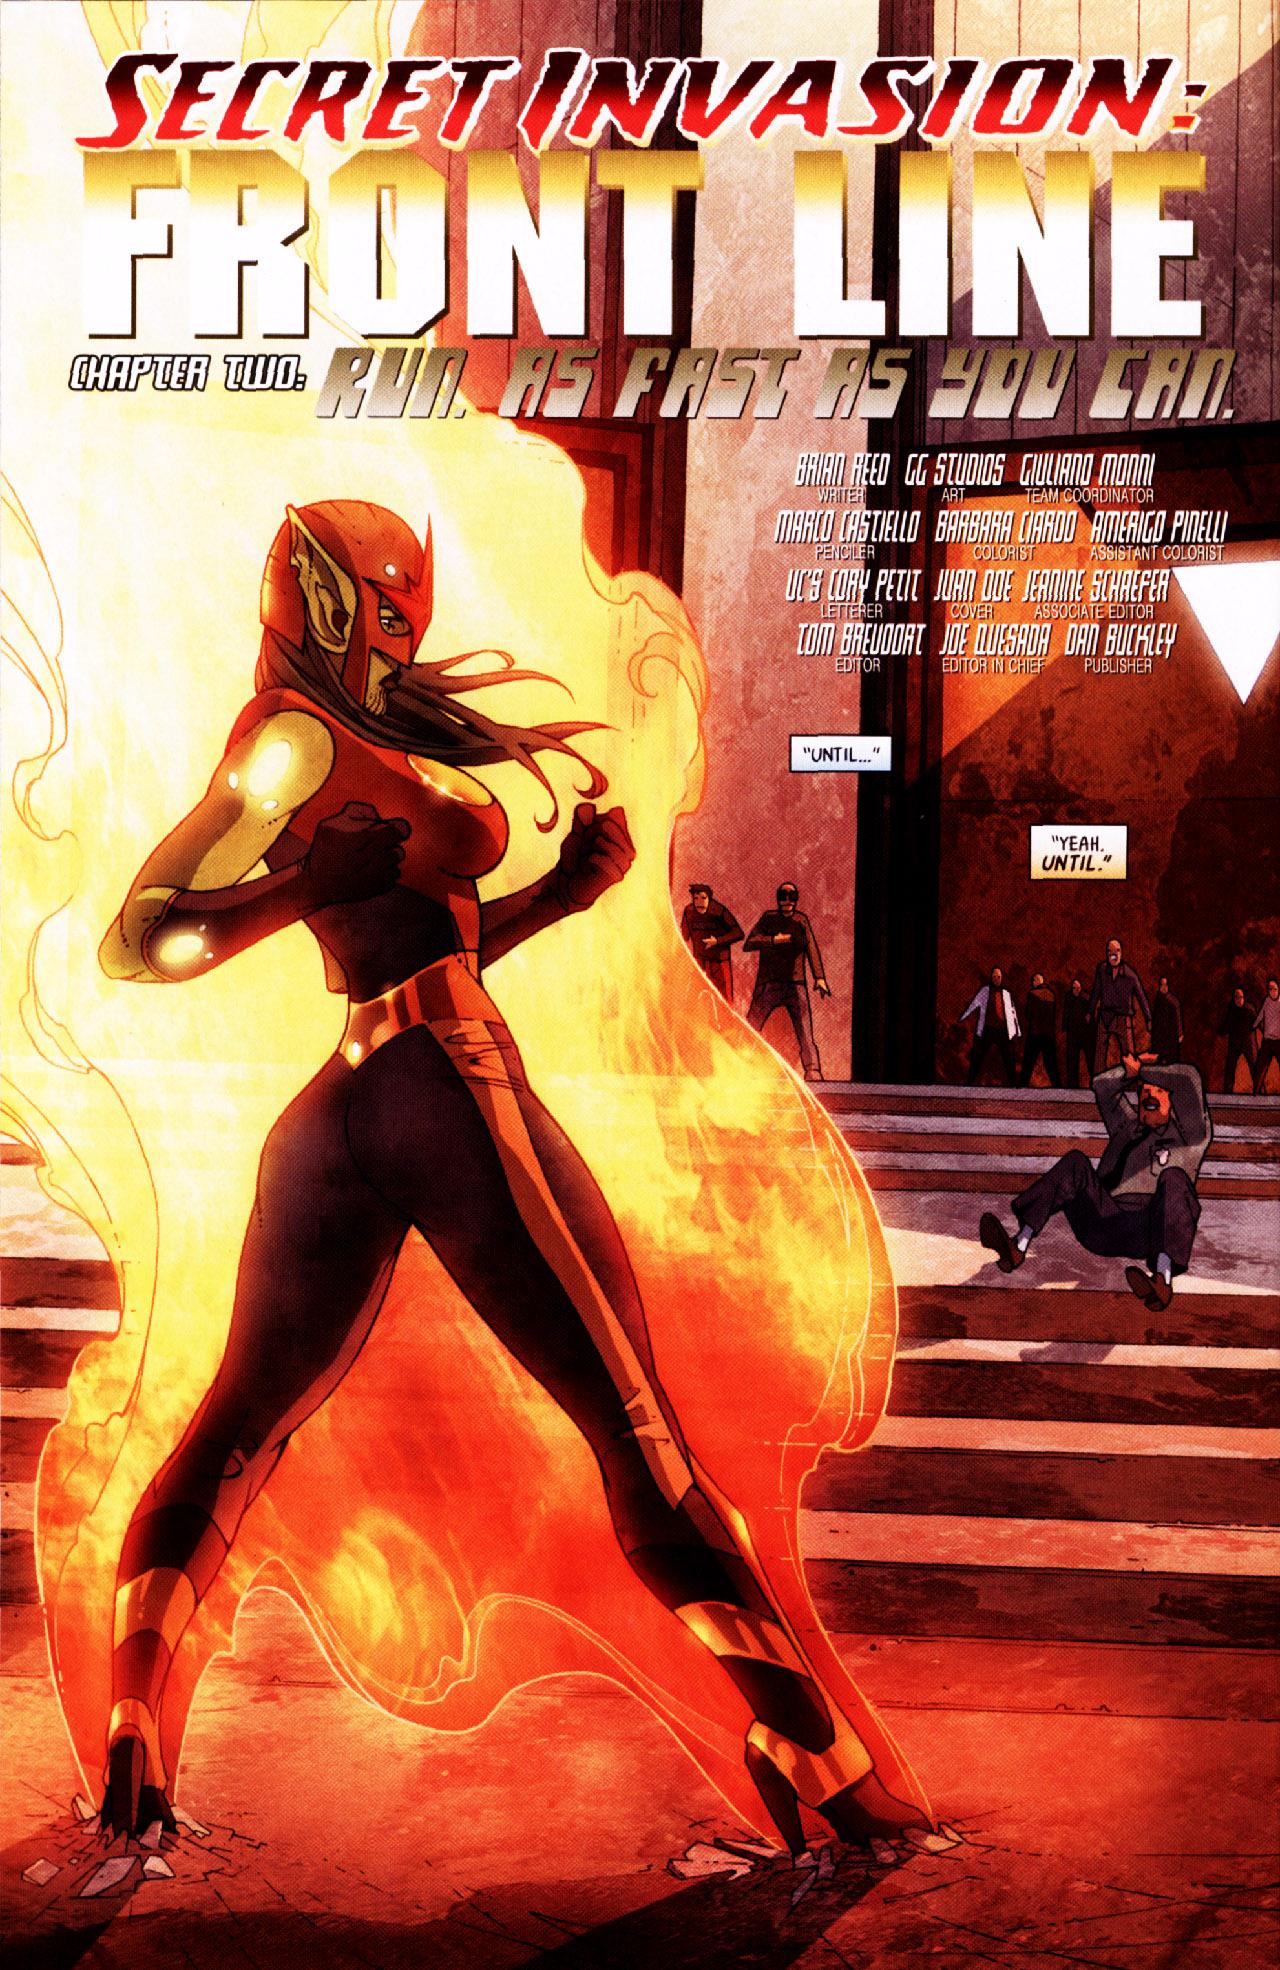 Read online Secret Invasion: Front Line comic -  Issue #2 - 9